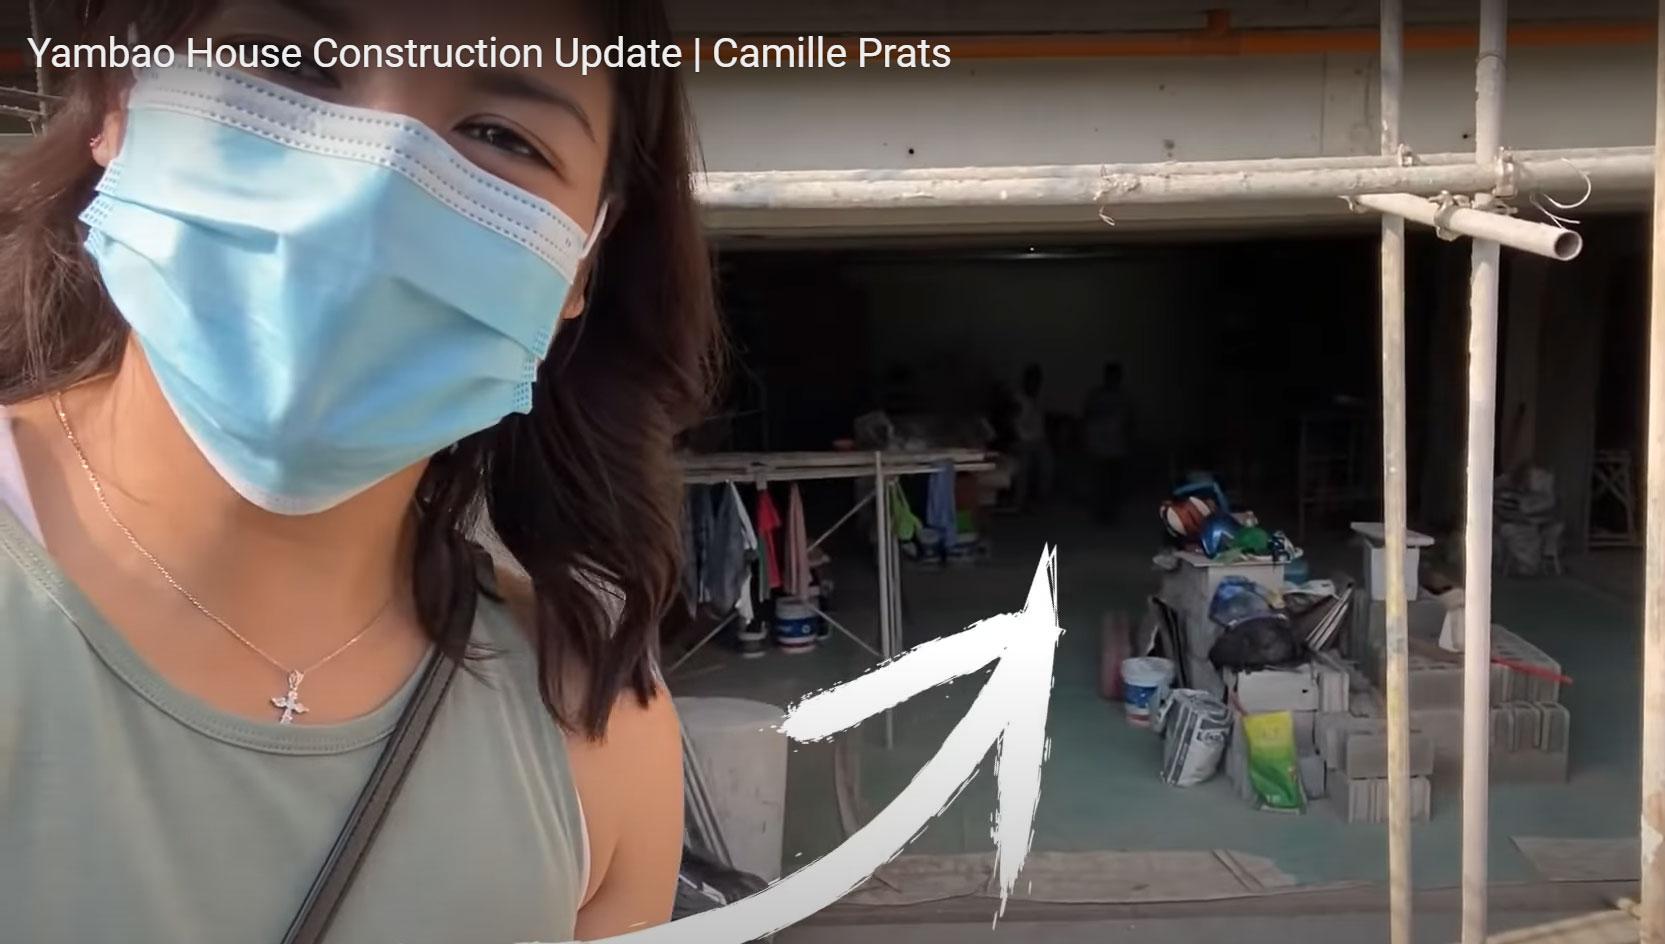 Camille Prats house